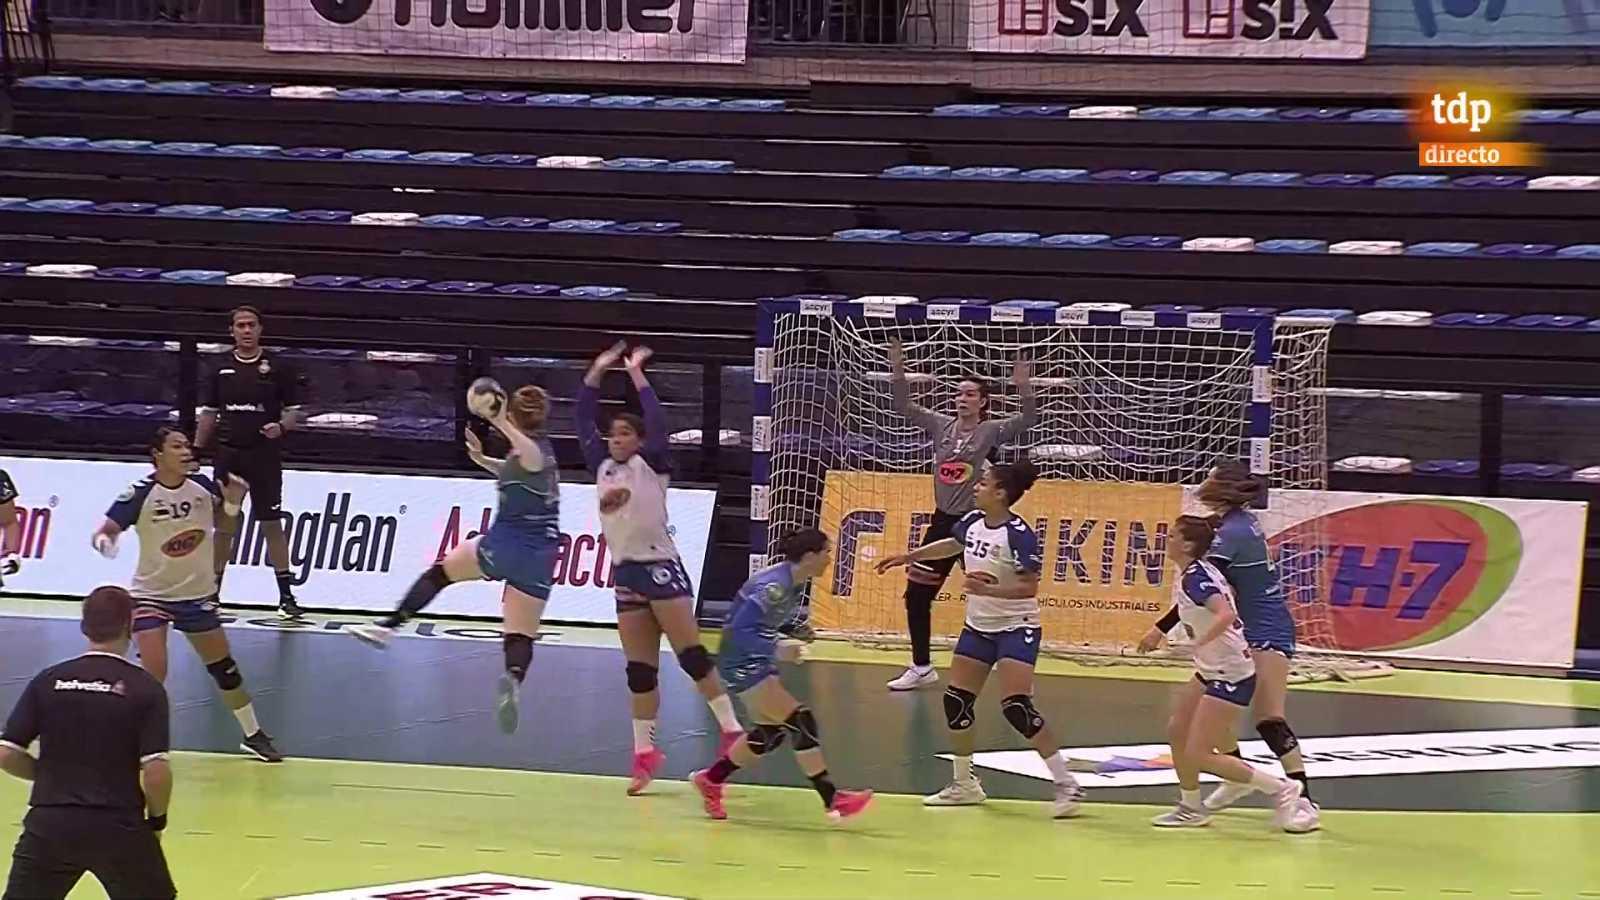 Balonmano - Liga Guerreras Iberdrola. 18ª jornada: KH7 Granollers - Super Amara Bera Bera - ver ahora